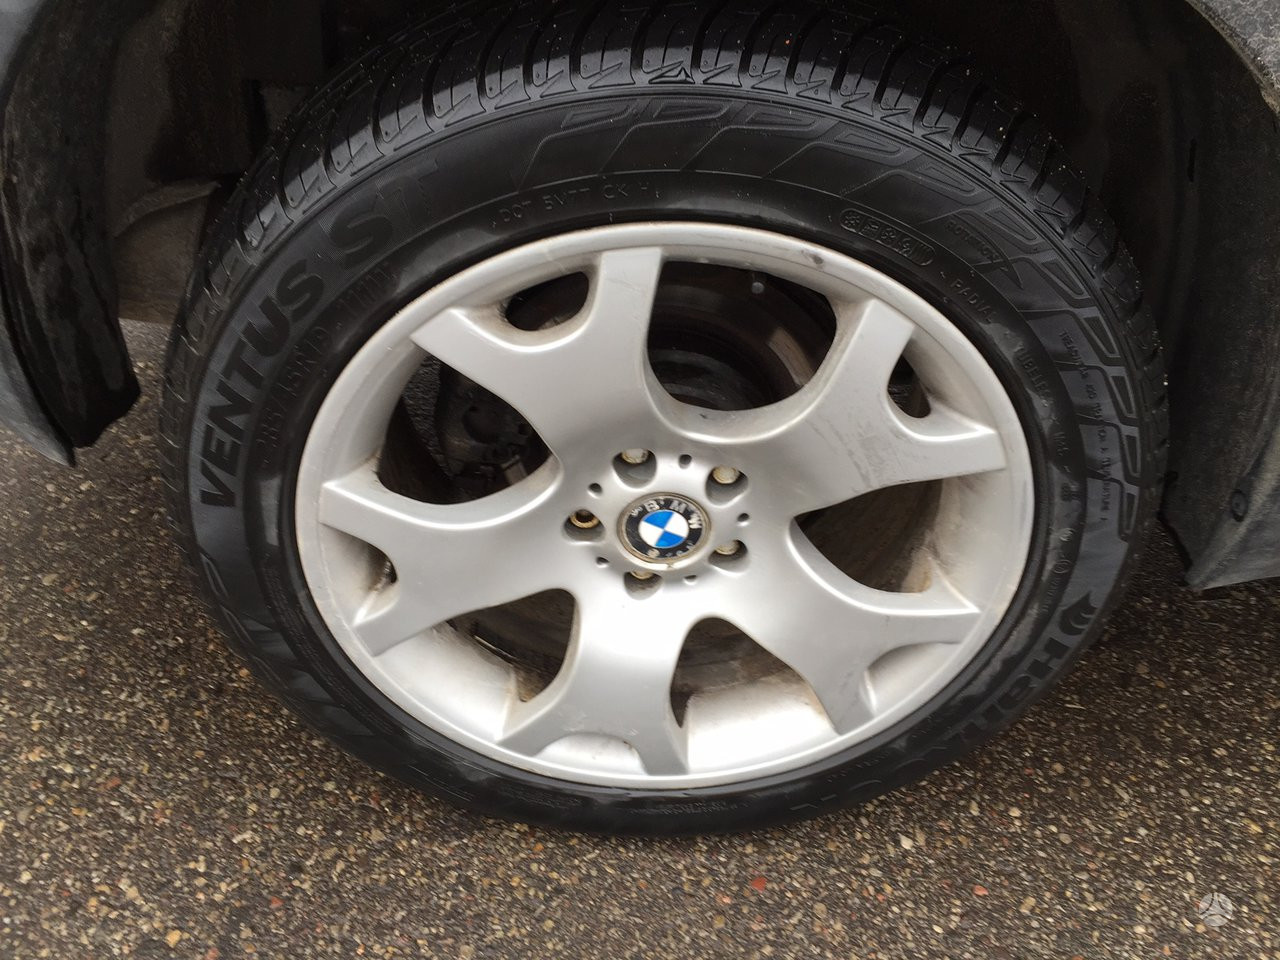 BMW X5 2003m Orginalūs Ratlankiai  70 € / vnt